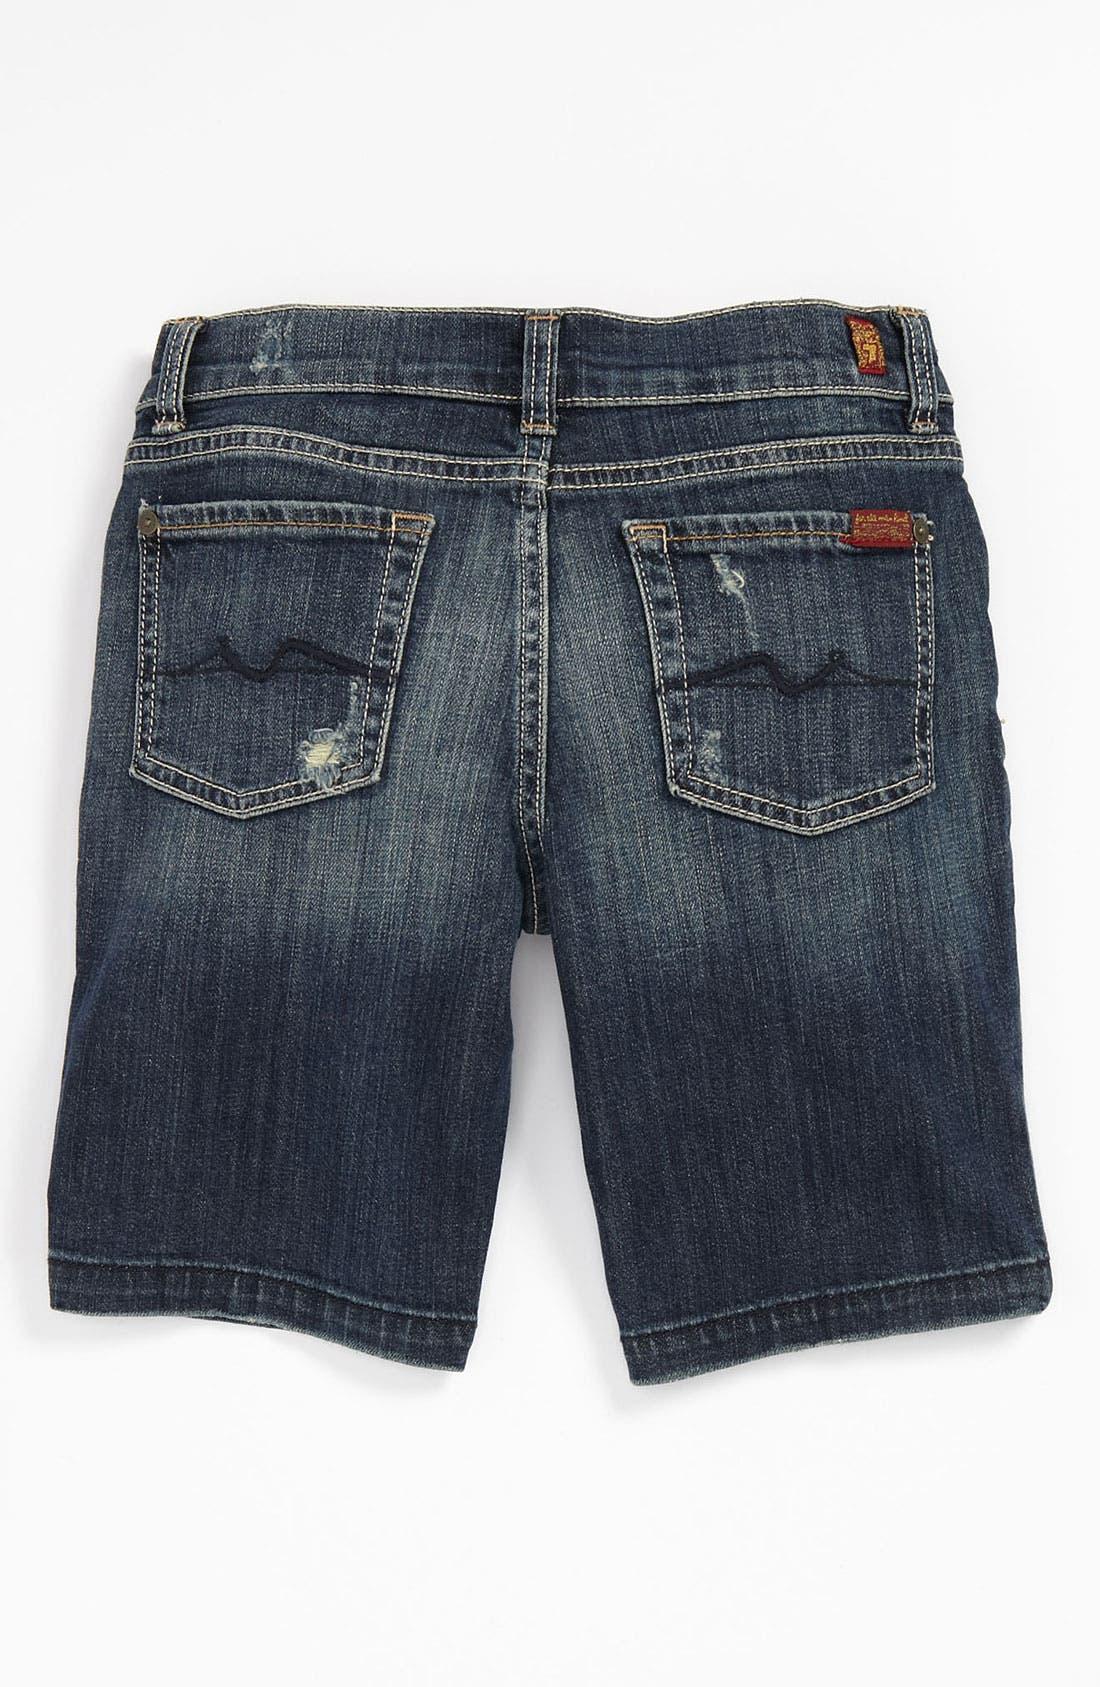 Alternate Image 1 Selected - 7 For All Mankind® 'Del Sol' Bermuda Shorts (Big Girls)